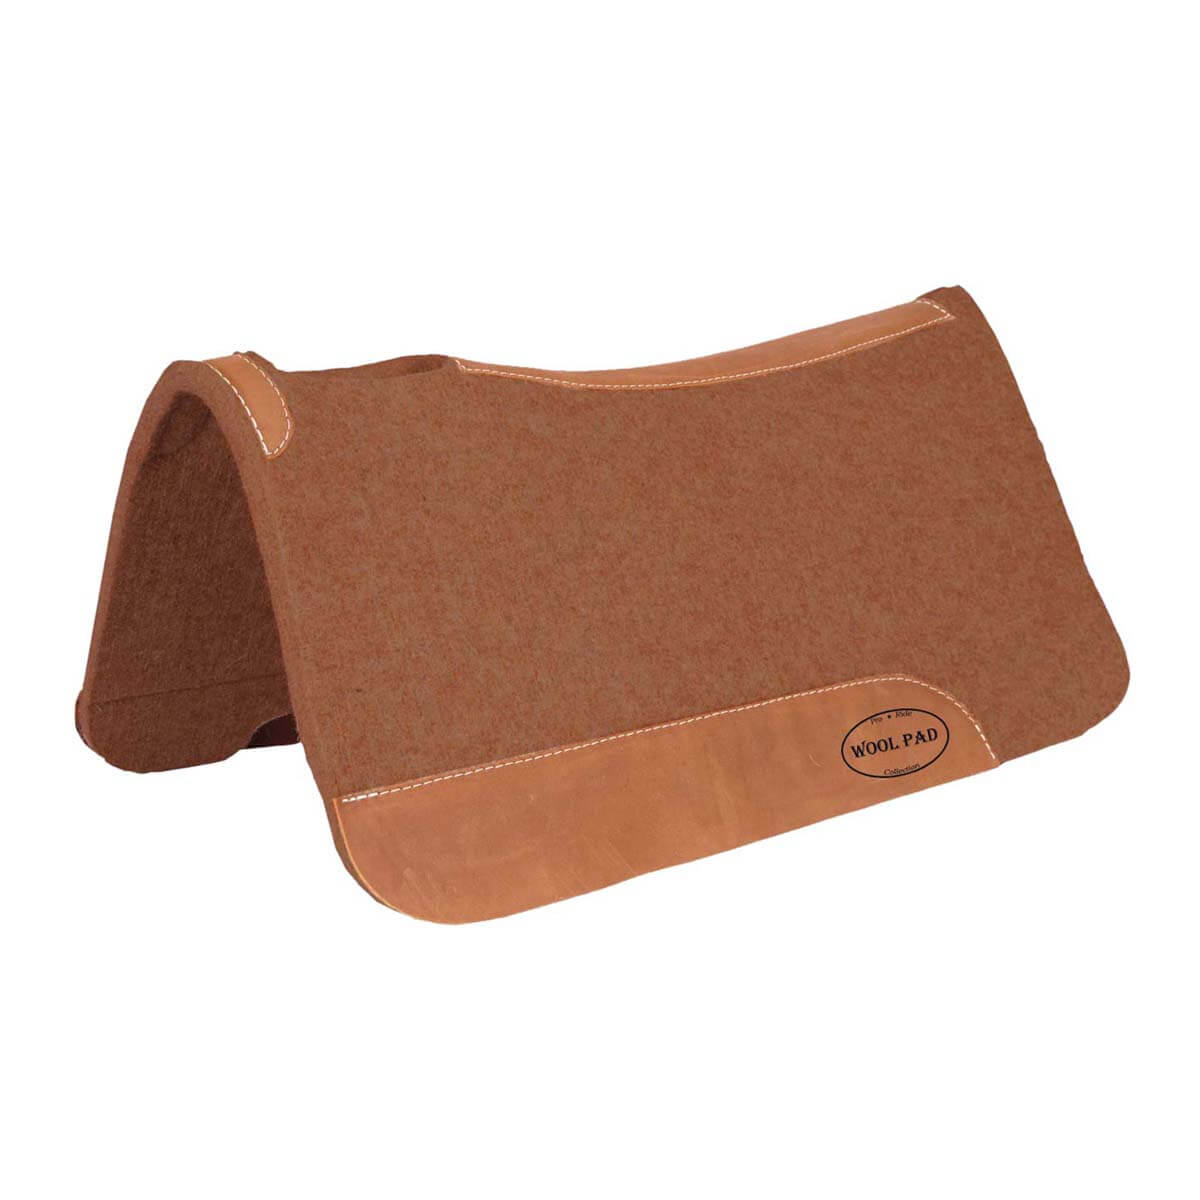 100% Wool Contoured Saddle Pad - Tan